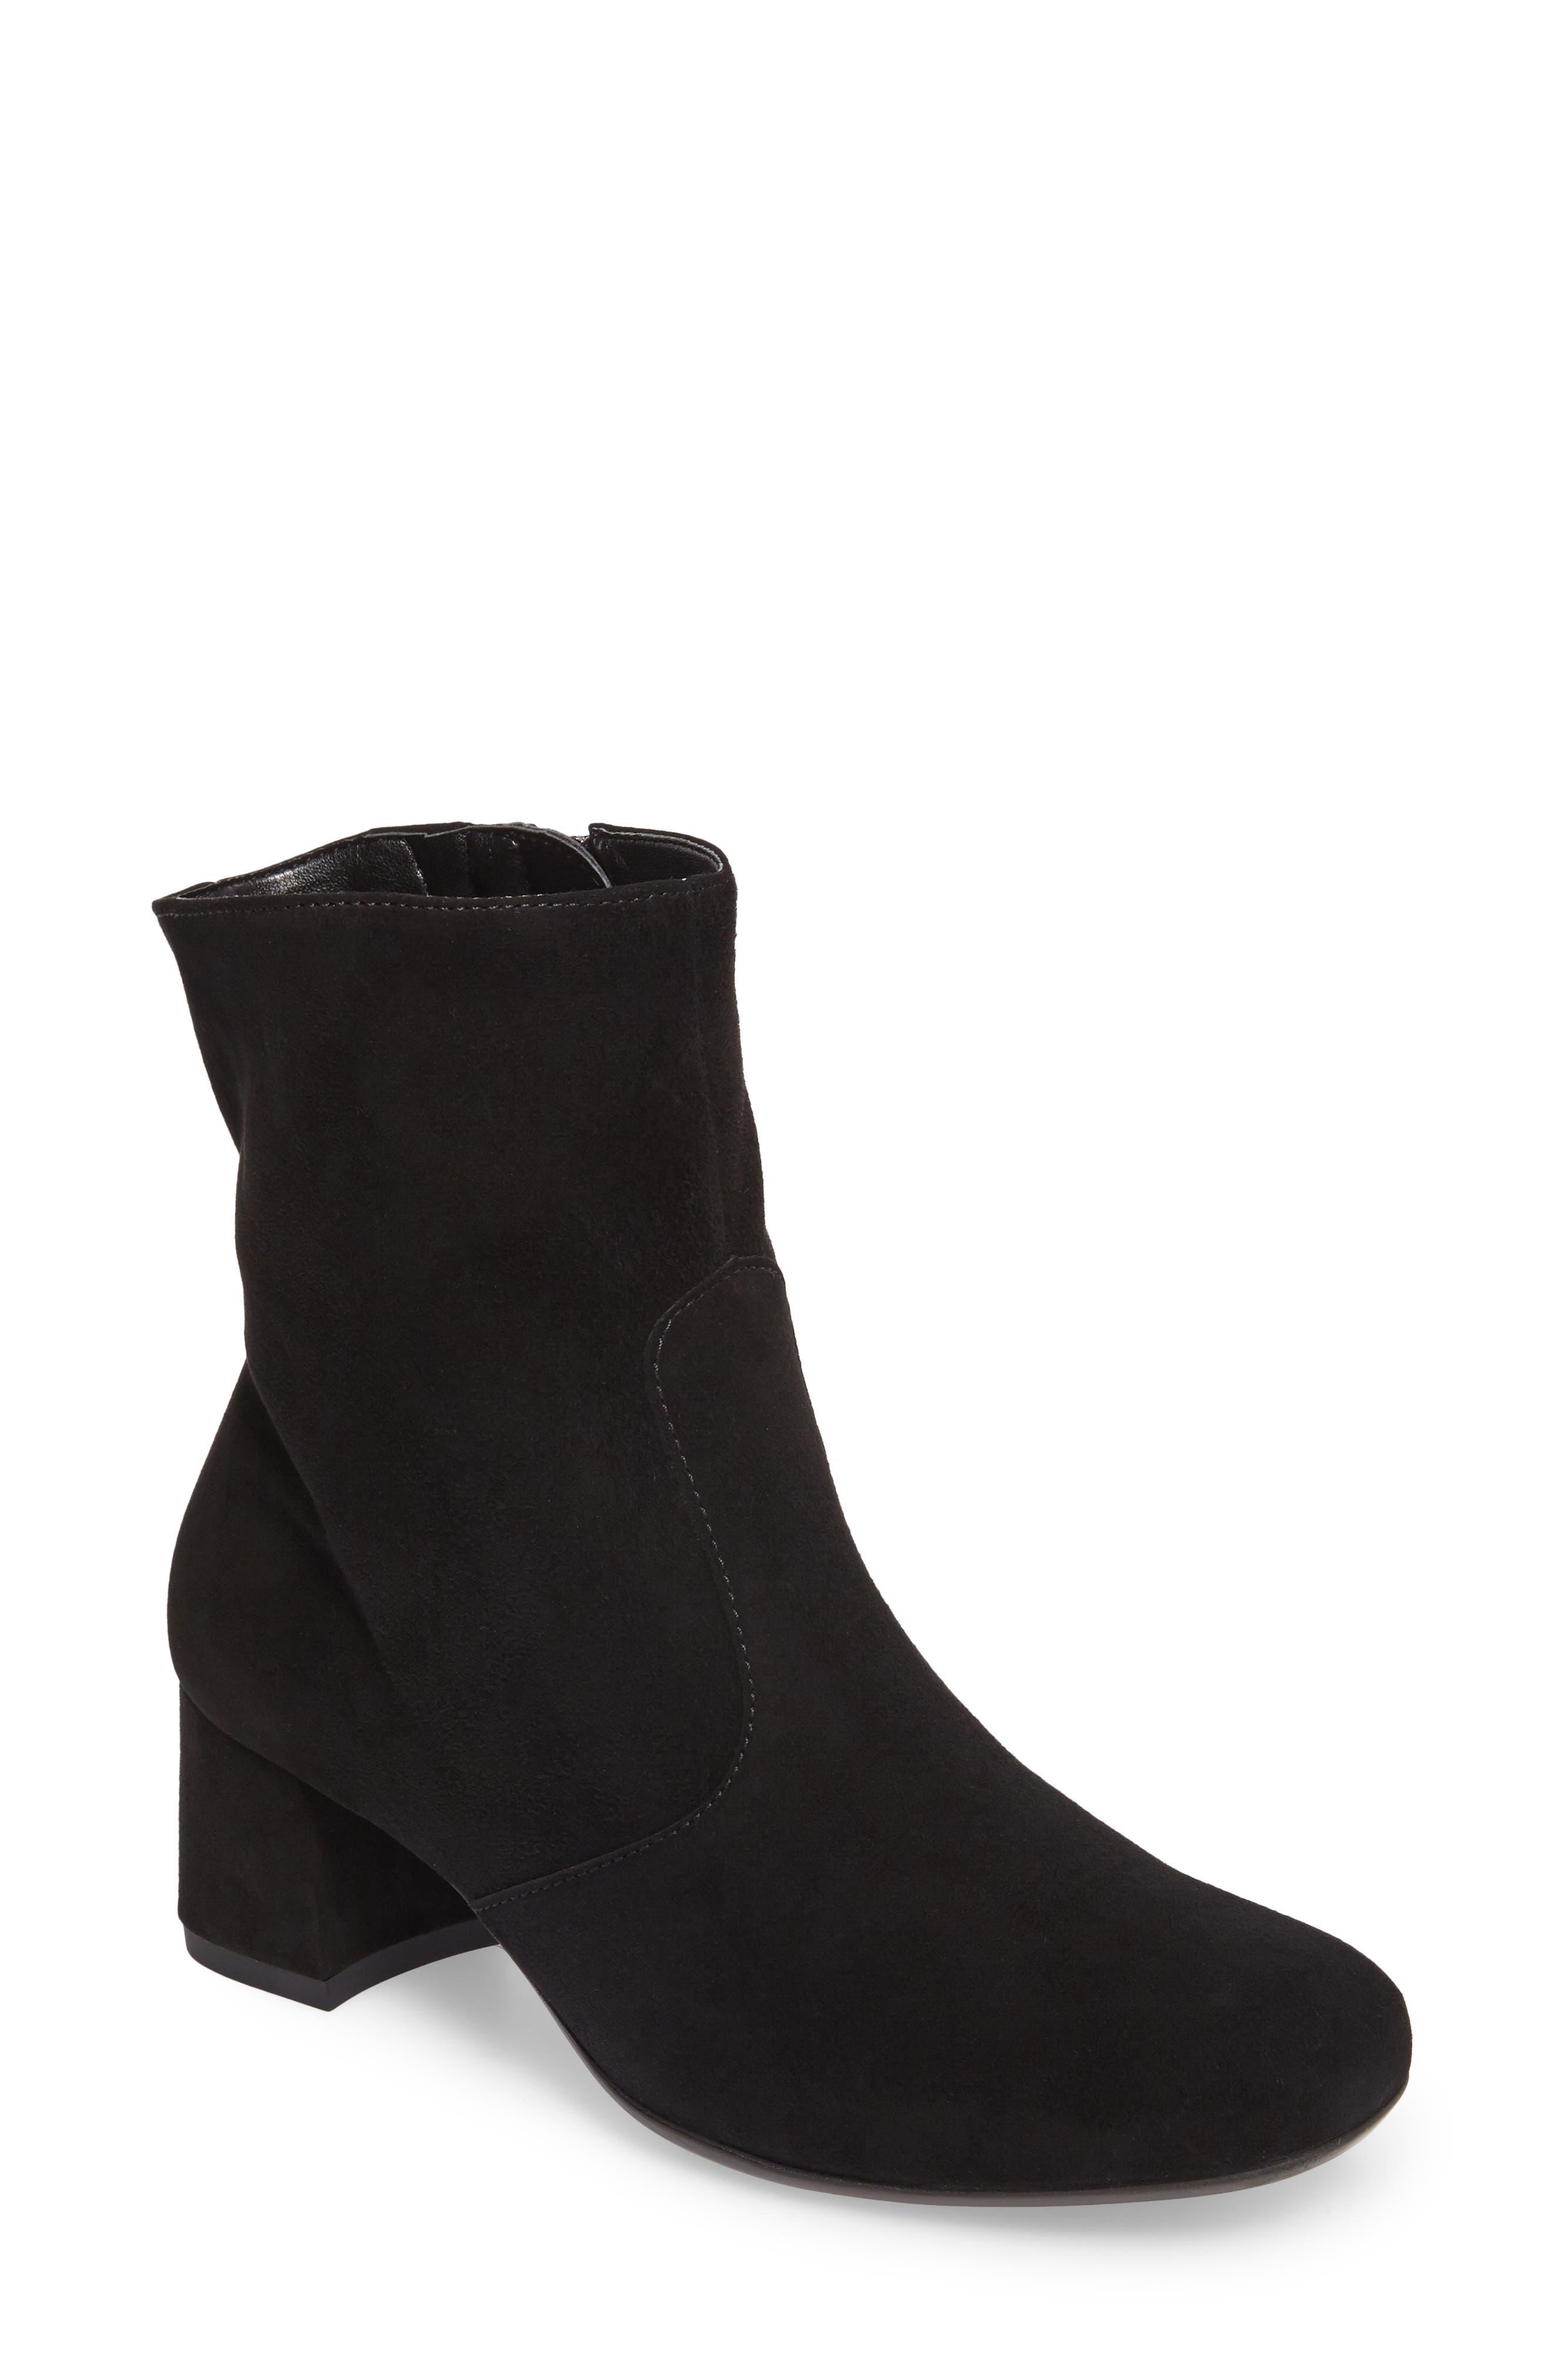 Carter Sock Bootie,                         Main,                         color, BLACK SUEDE